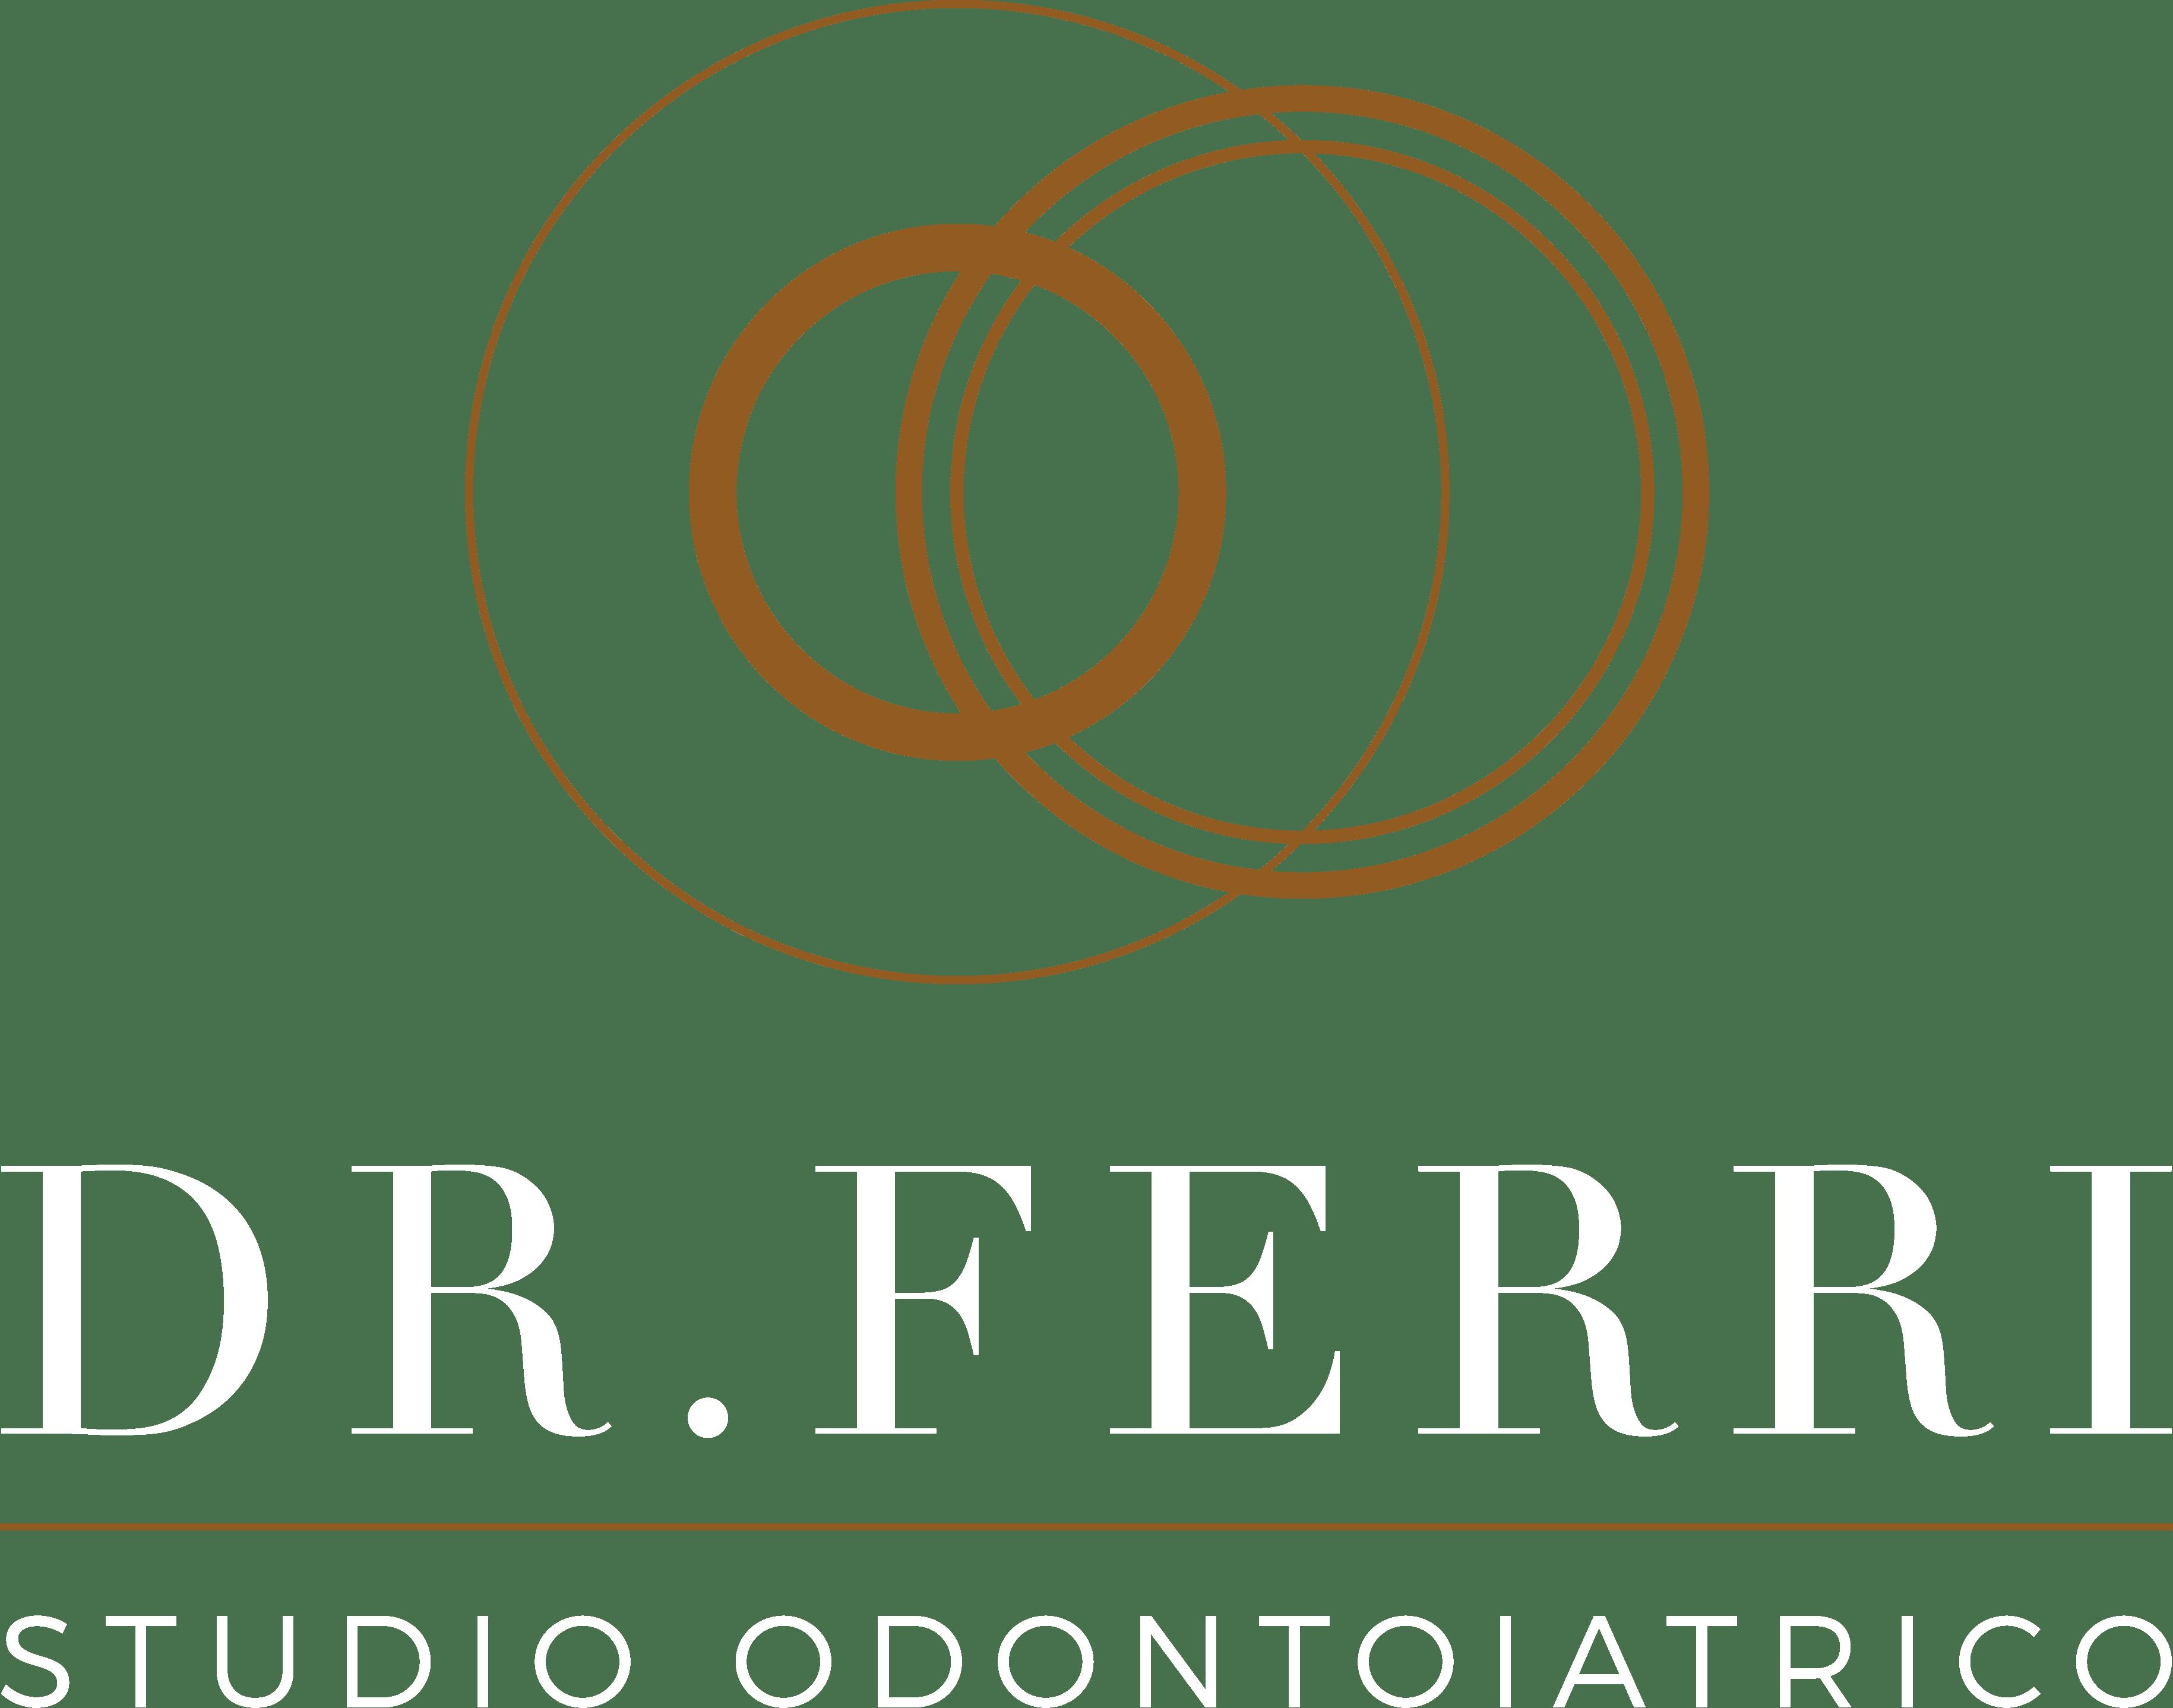 Studio-Odontoiatrico-Ferri-logo